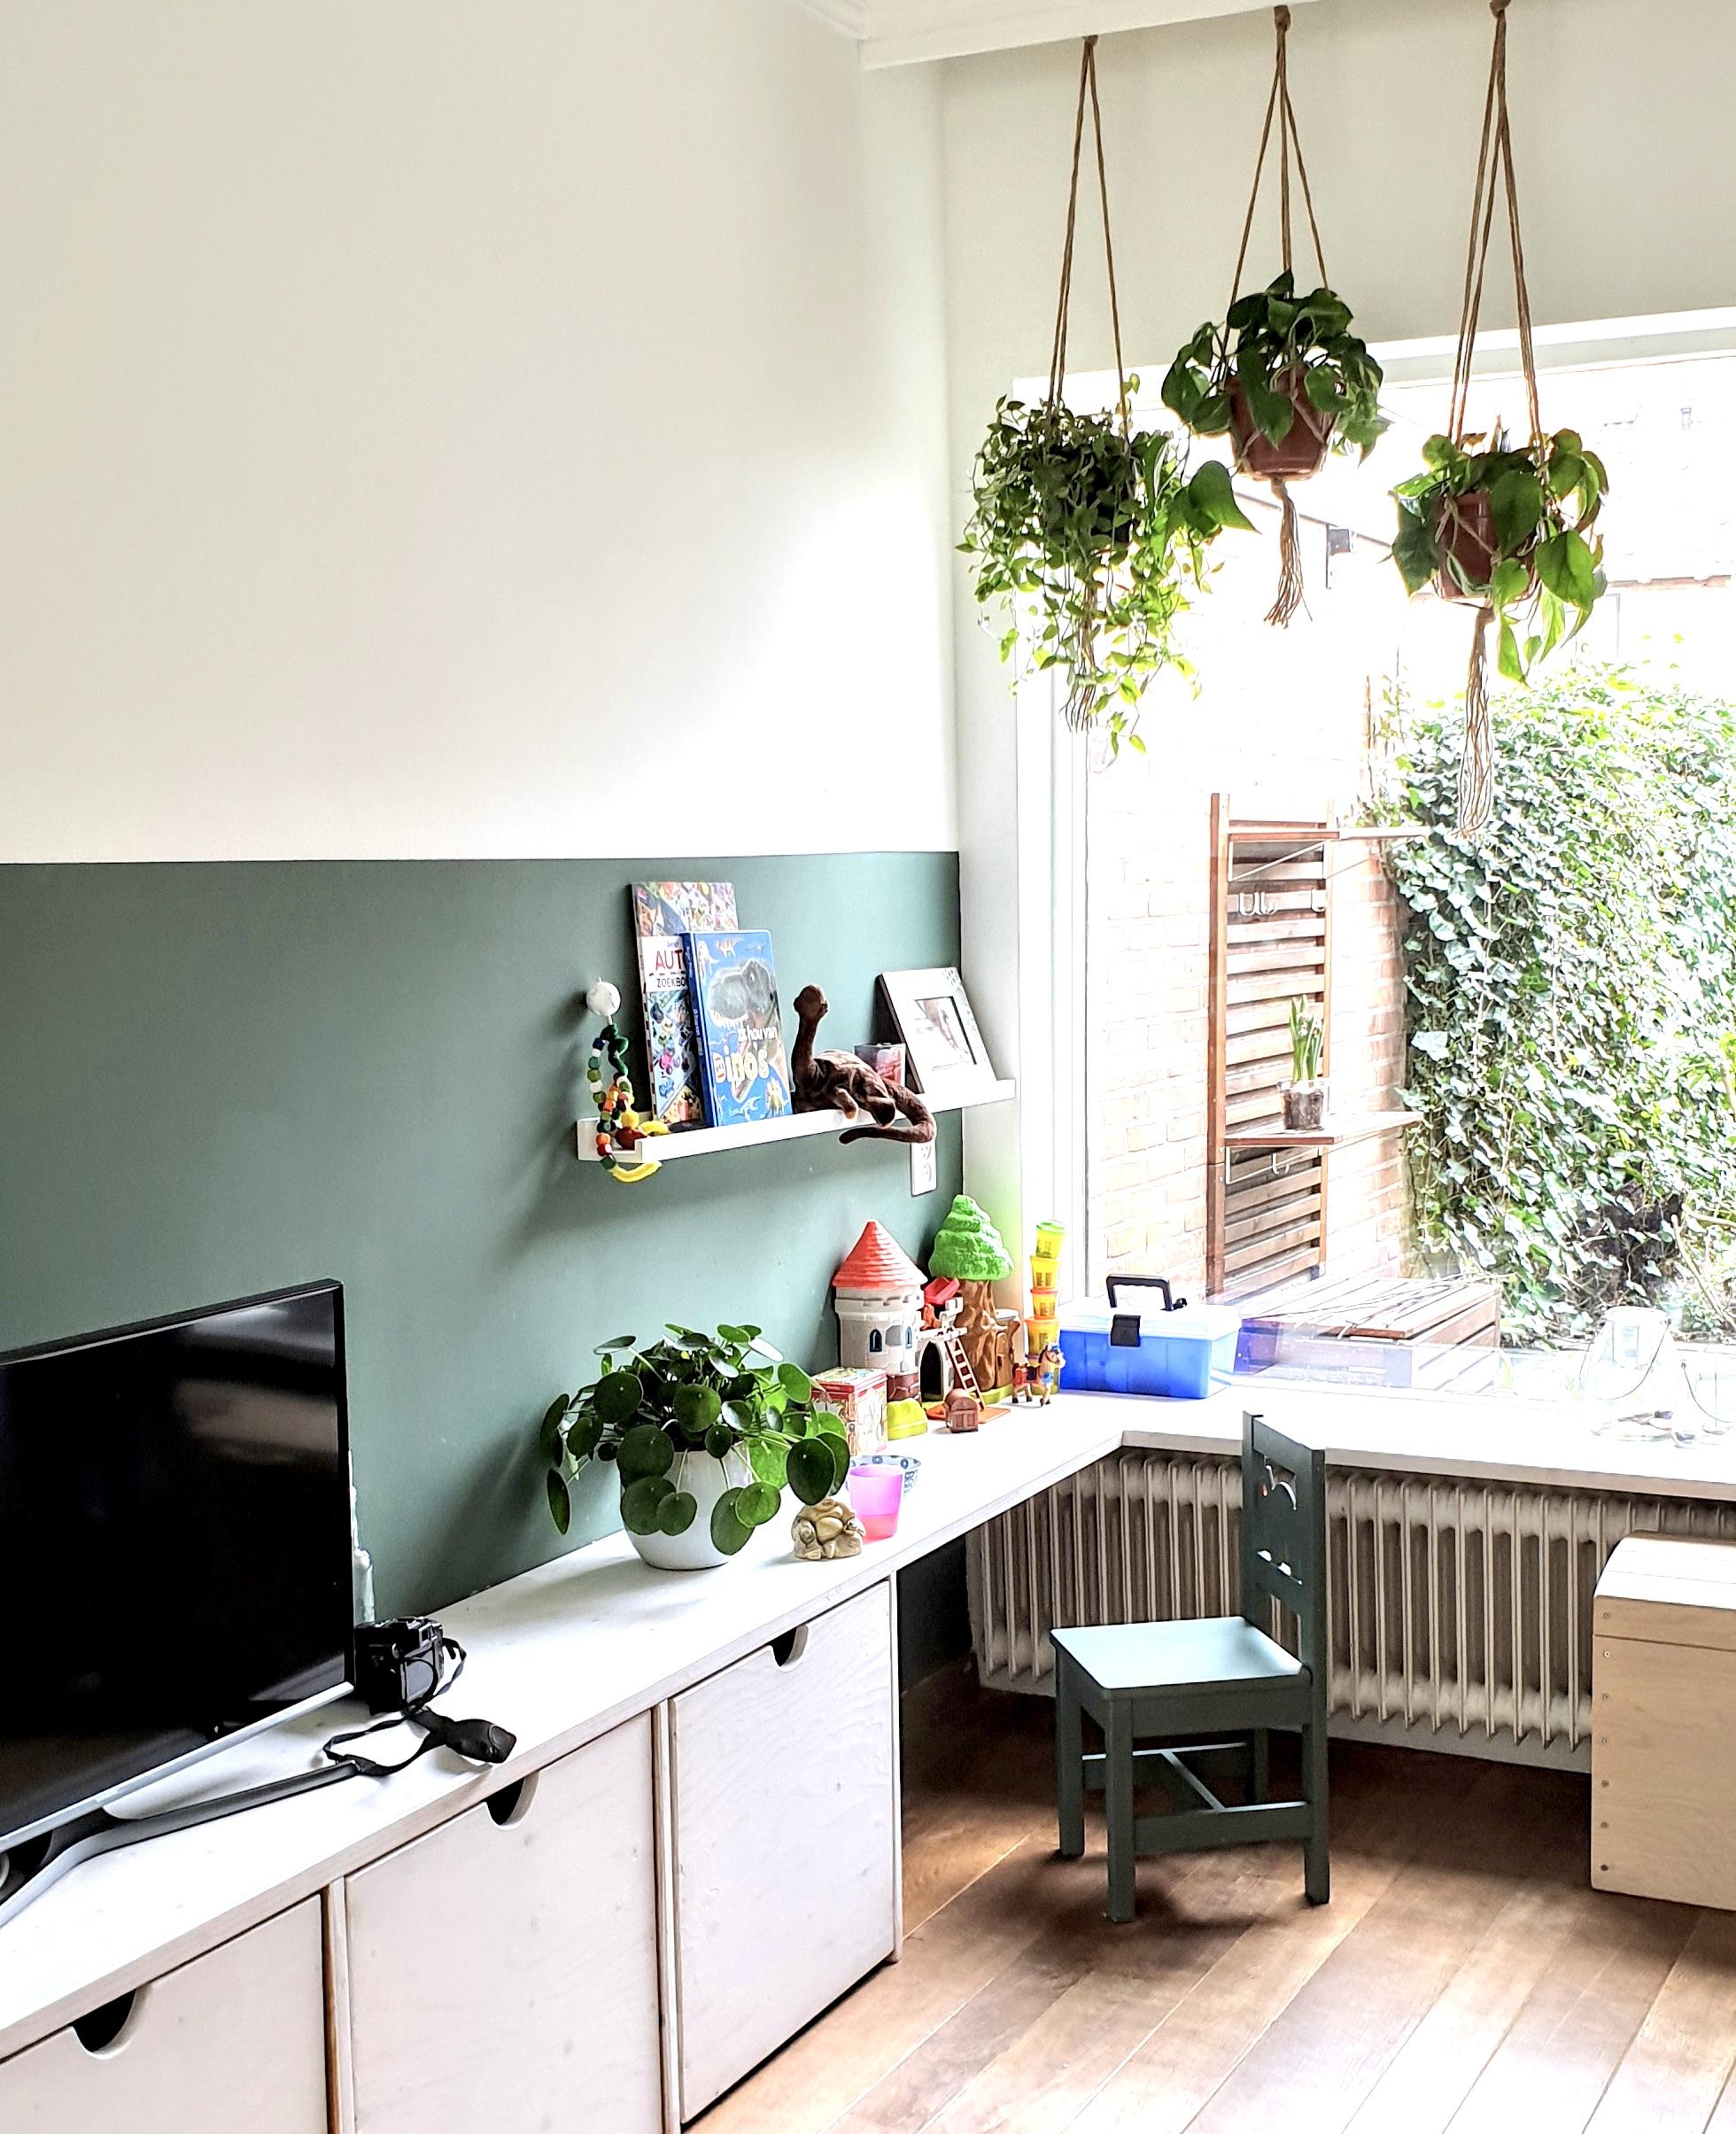 Interieuradvies - interieur - stylingadvies - Zwolle - inrichting - interieurstyling